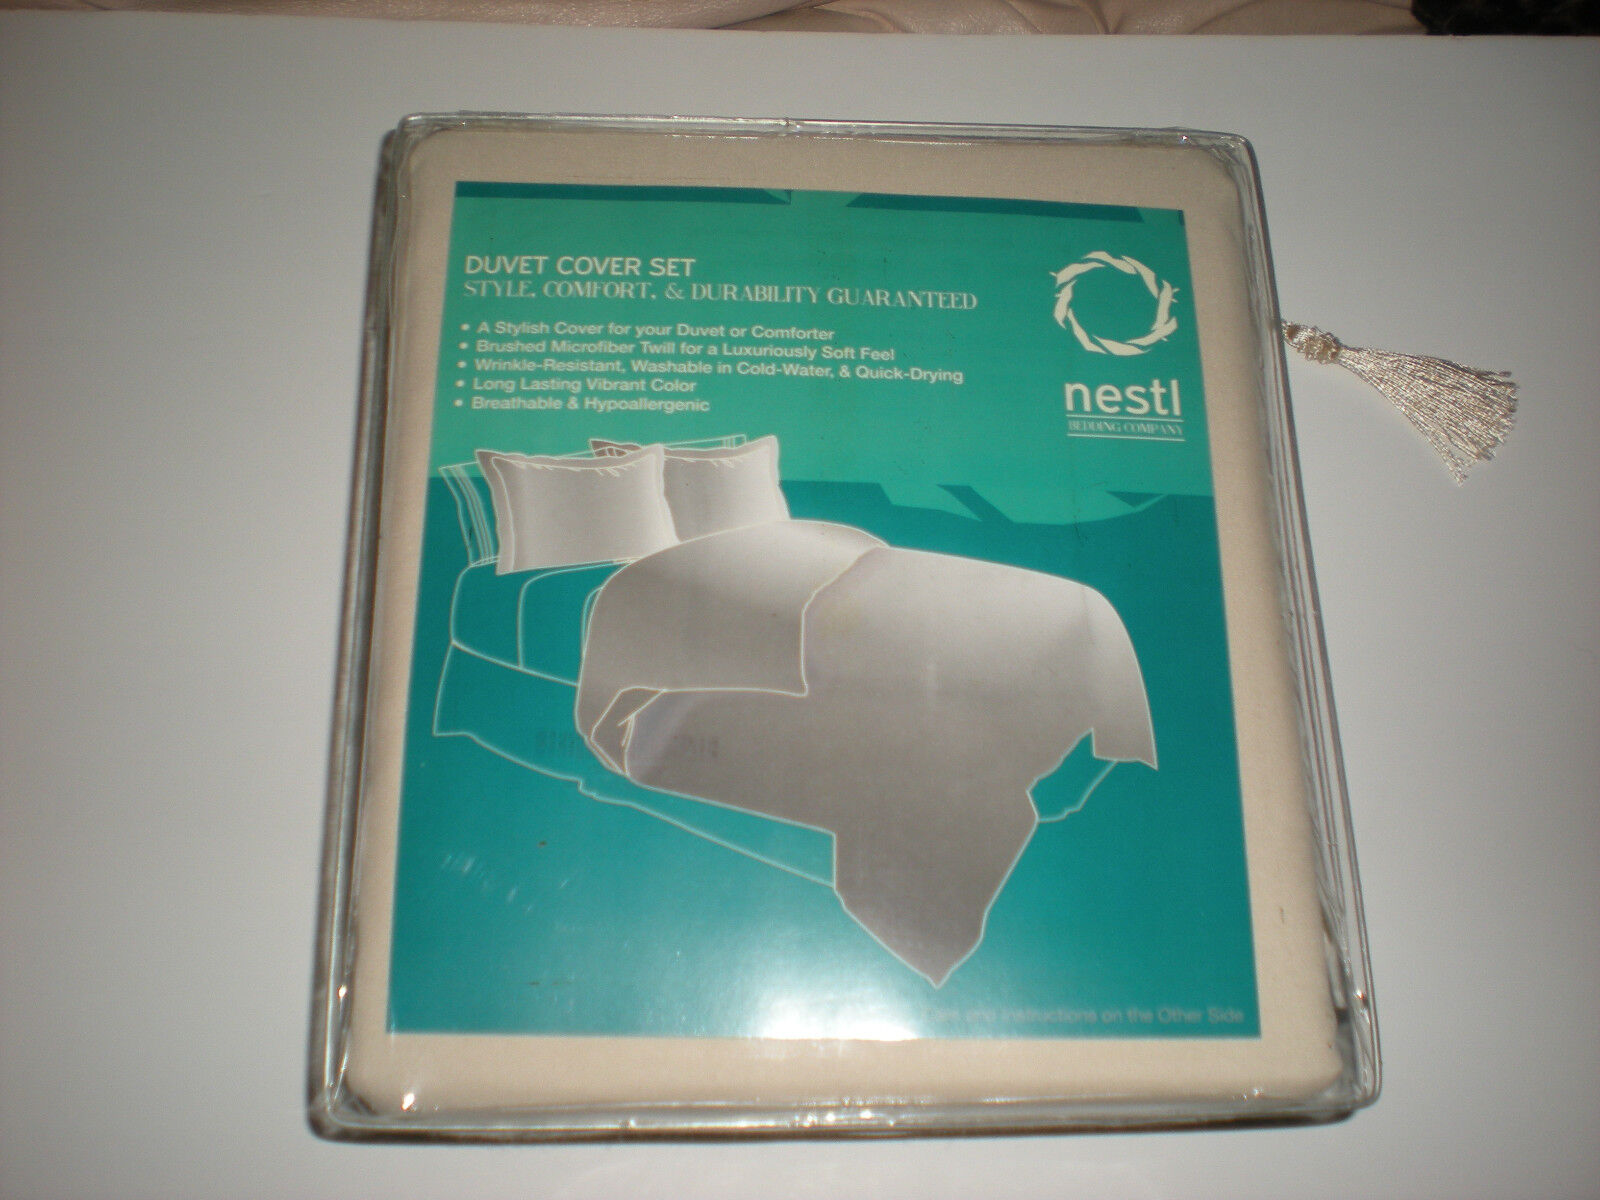 Nestl Bedding Duvet Cover & Pillow Shams 3 Piece Set Cream C